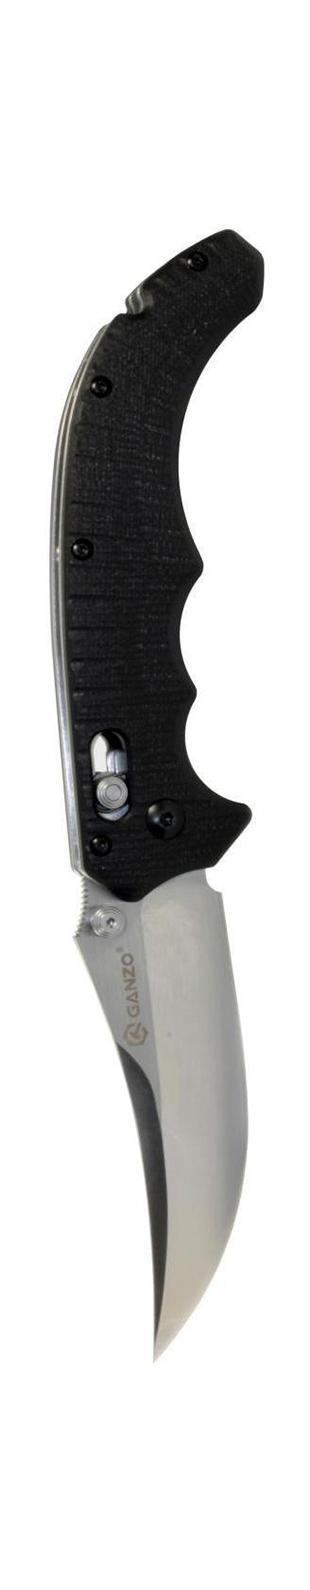 Нож туристический Ganzo, складной. G712 нож туристический ganzo складной g712